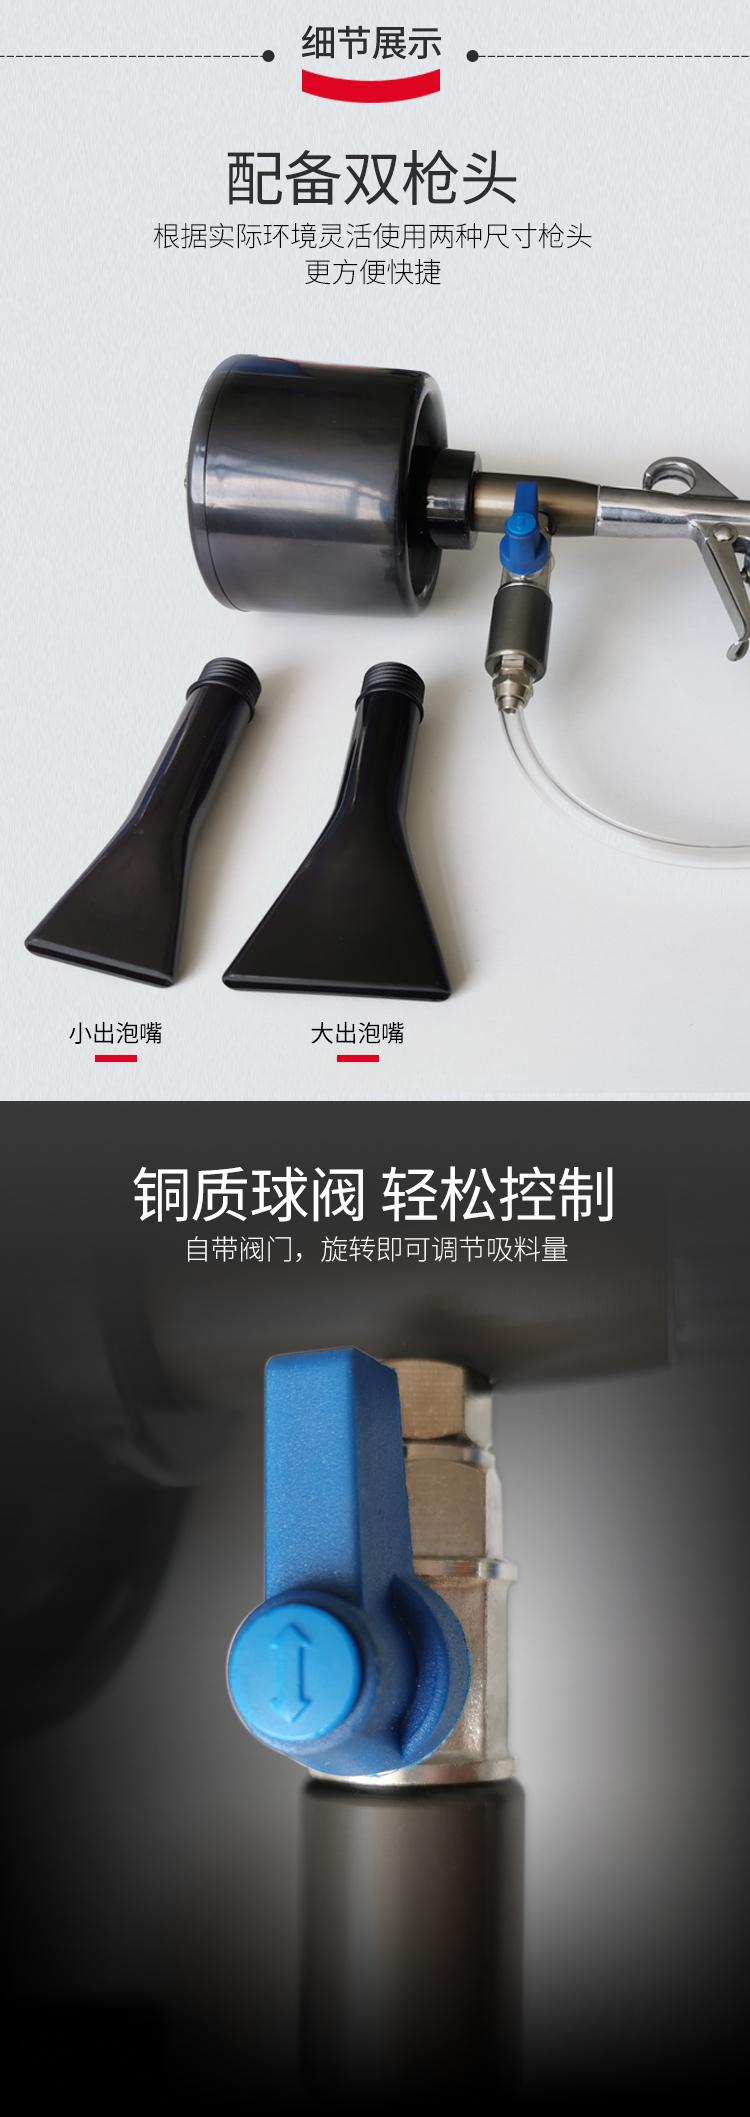 TWG2810-龙卷风双管泡沫枪_02